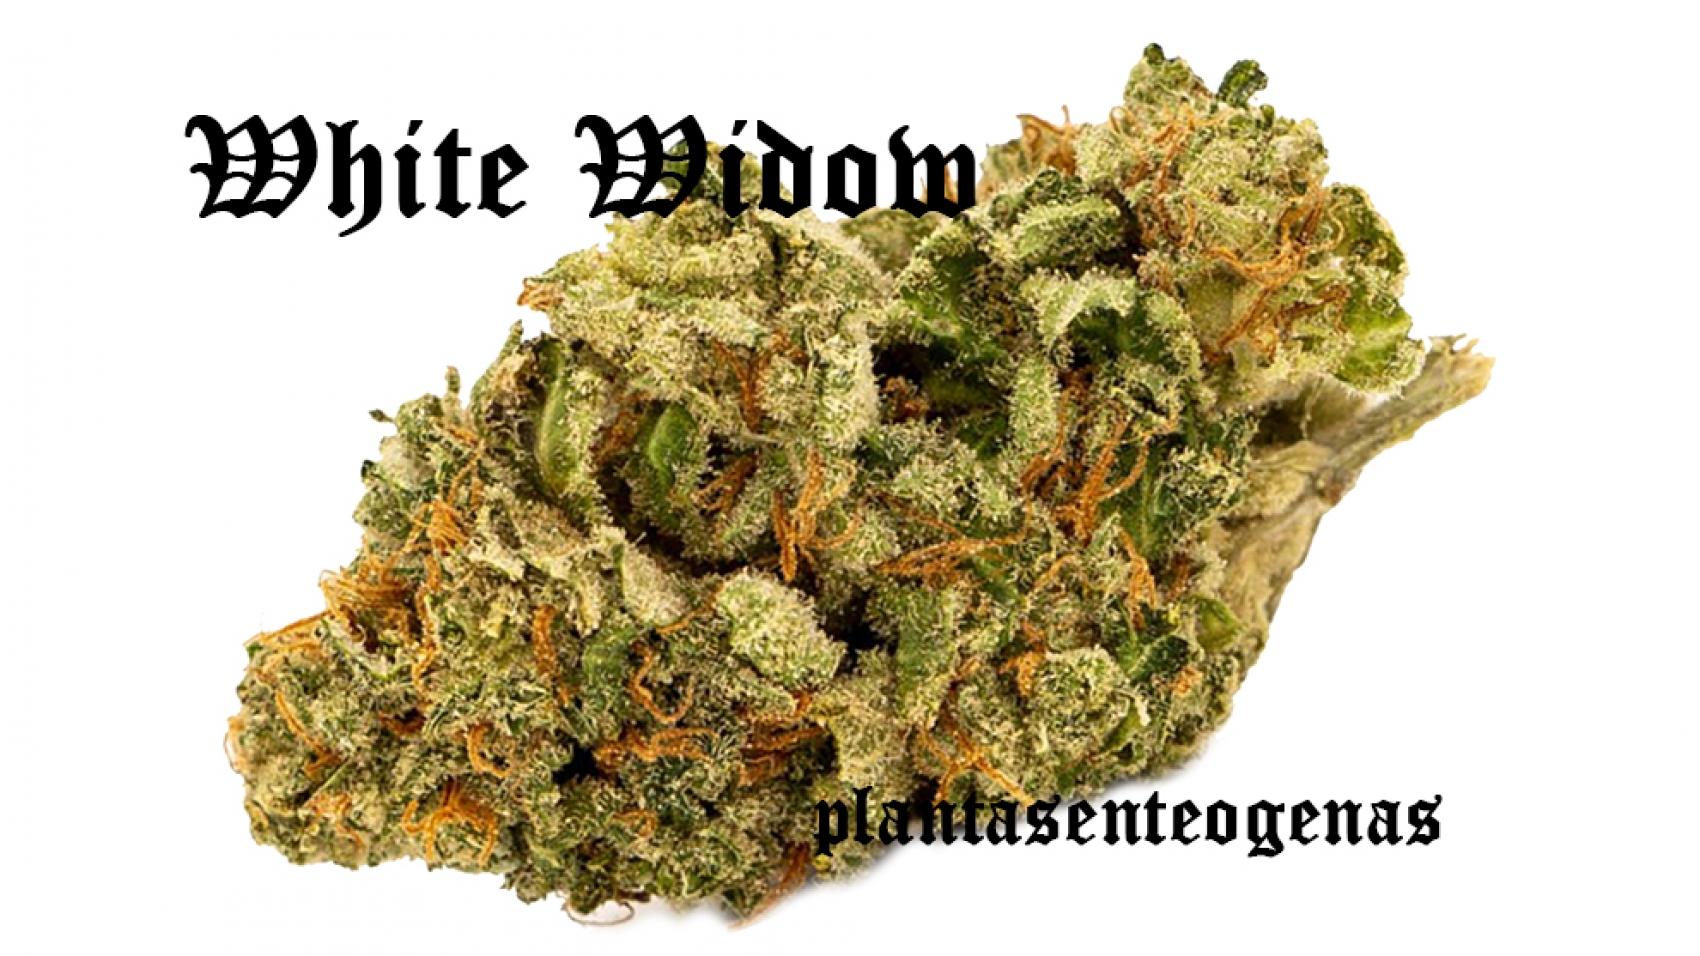 white-widow-2